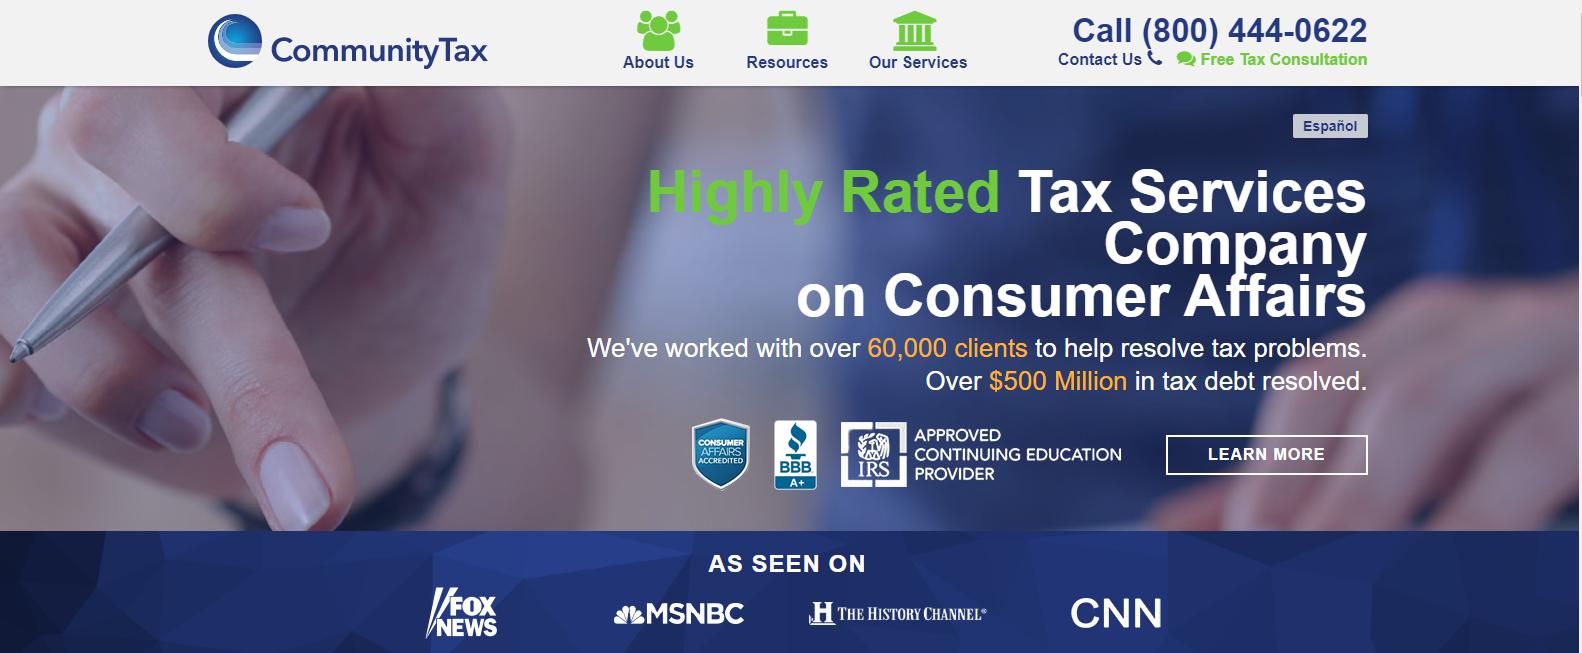 Community Tax website